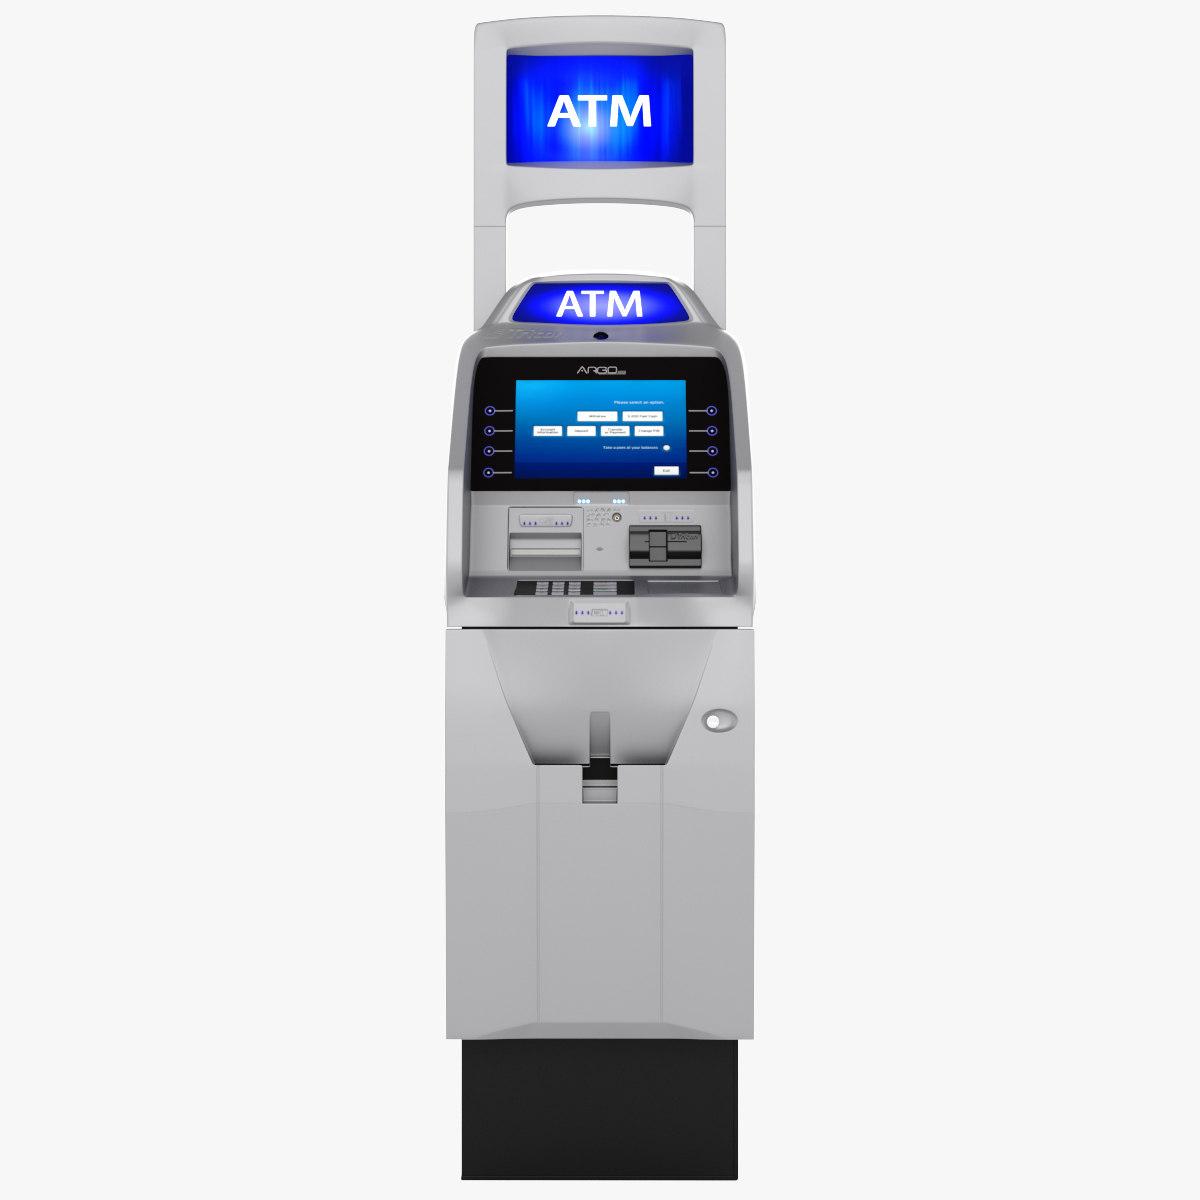 ATM_Triton_Argo_00079.jpg